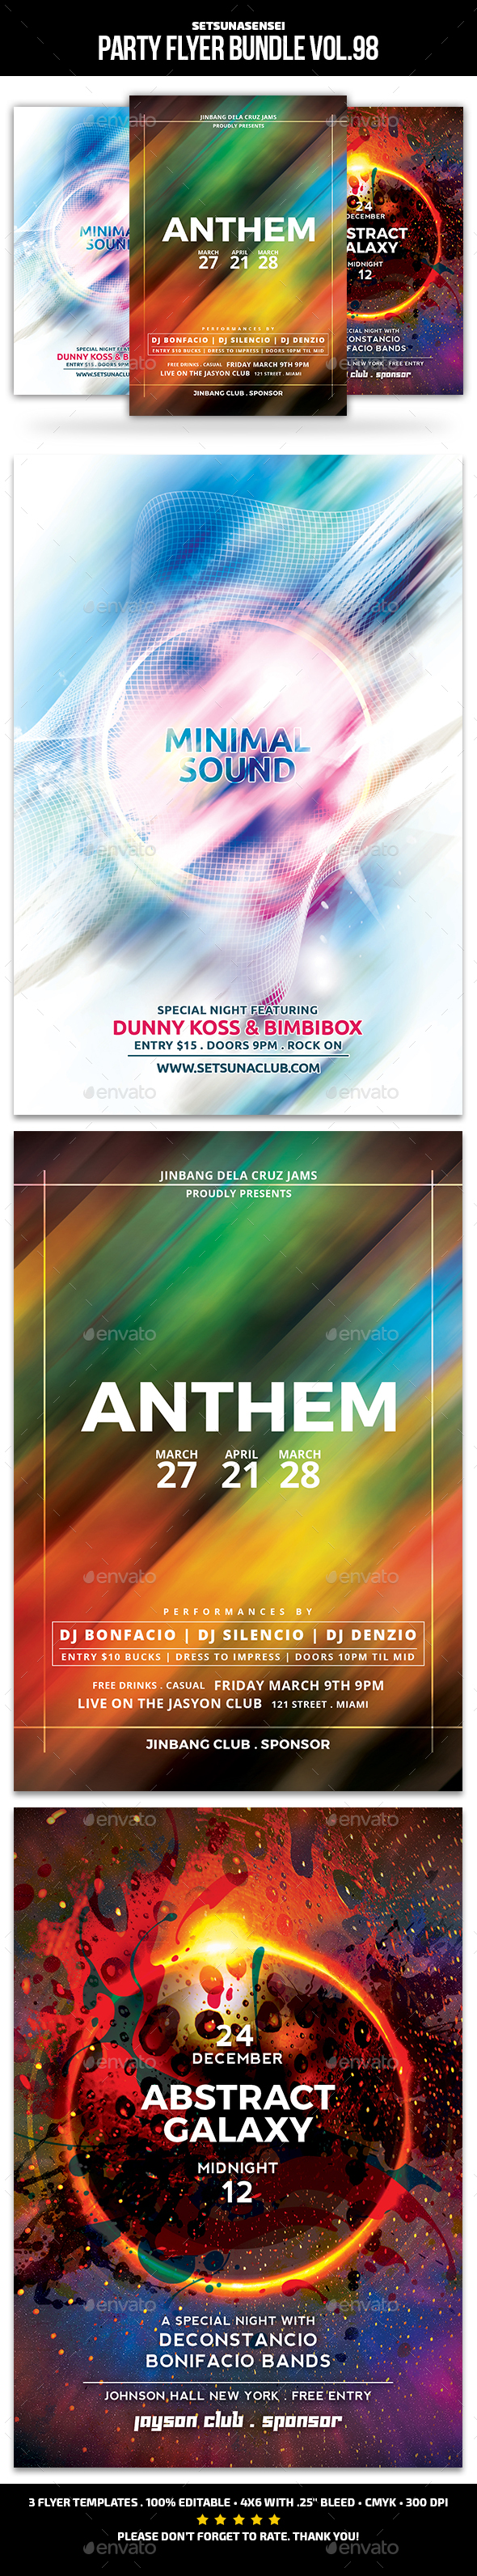 Party Flyer Bundle Vol.98 - Events Flyers